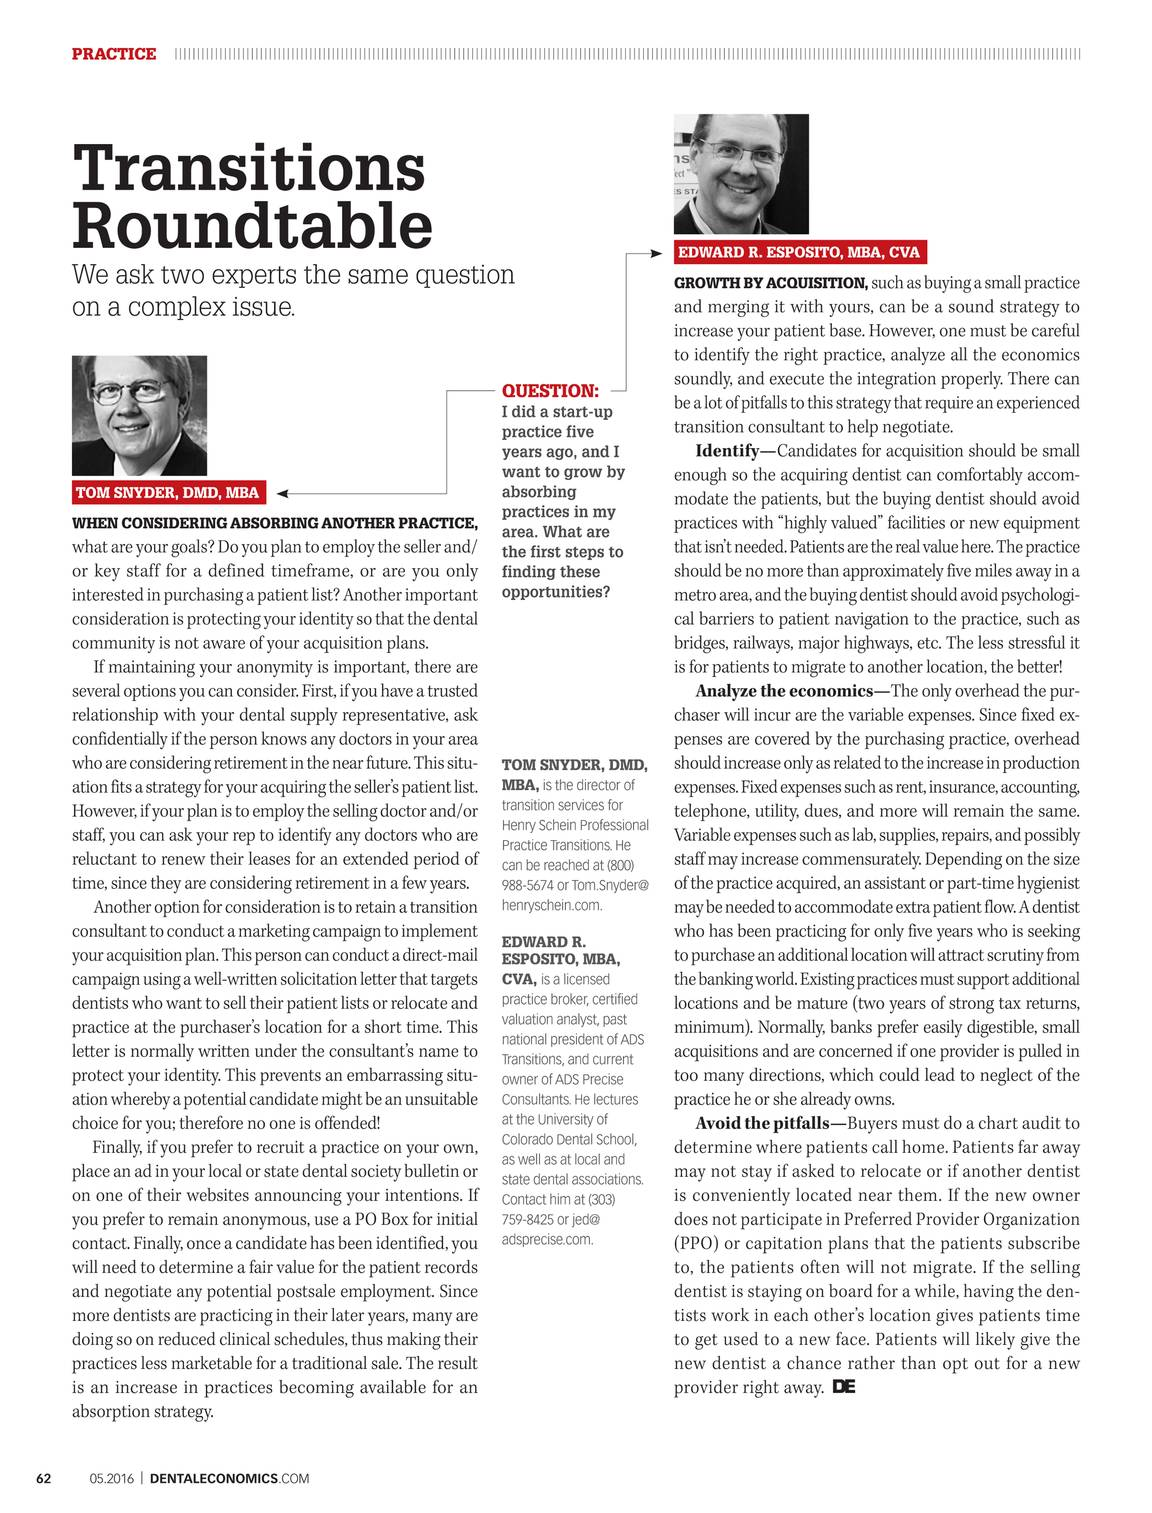 Dental Economics - May 2016 - page 63